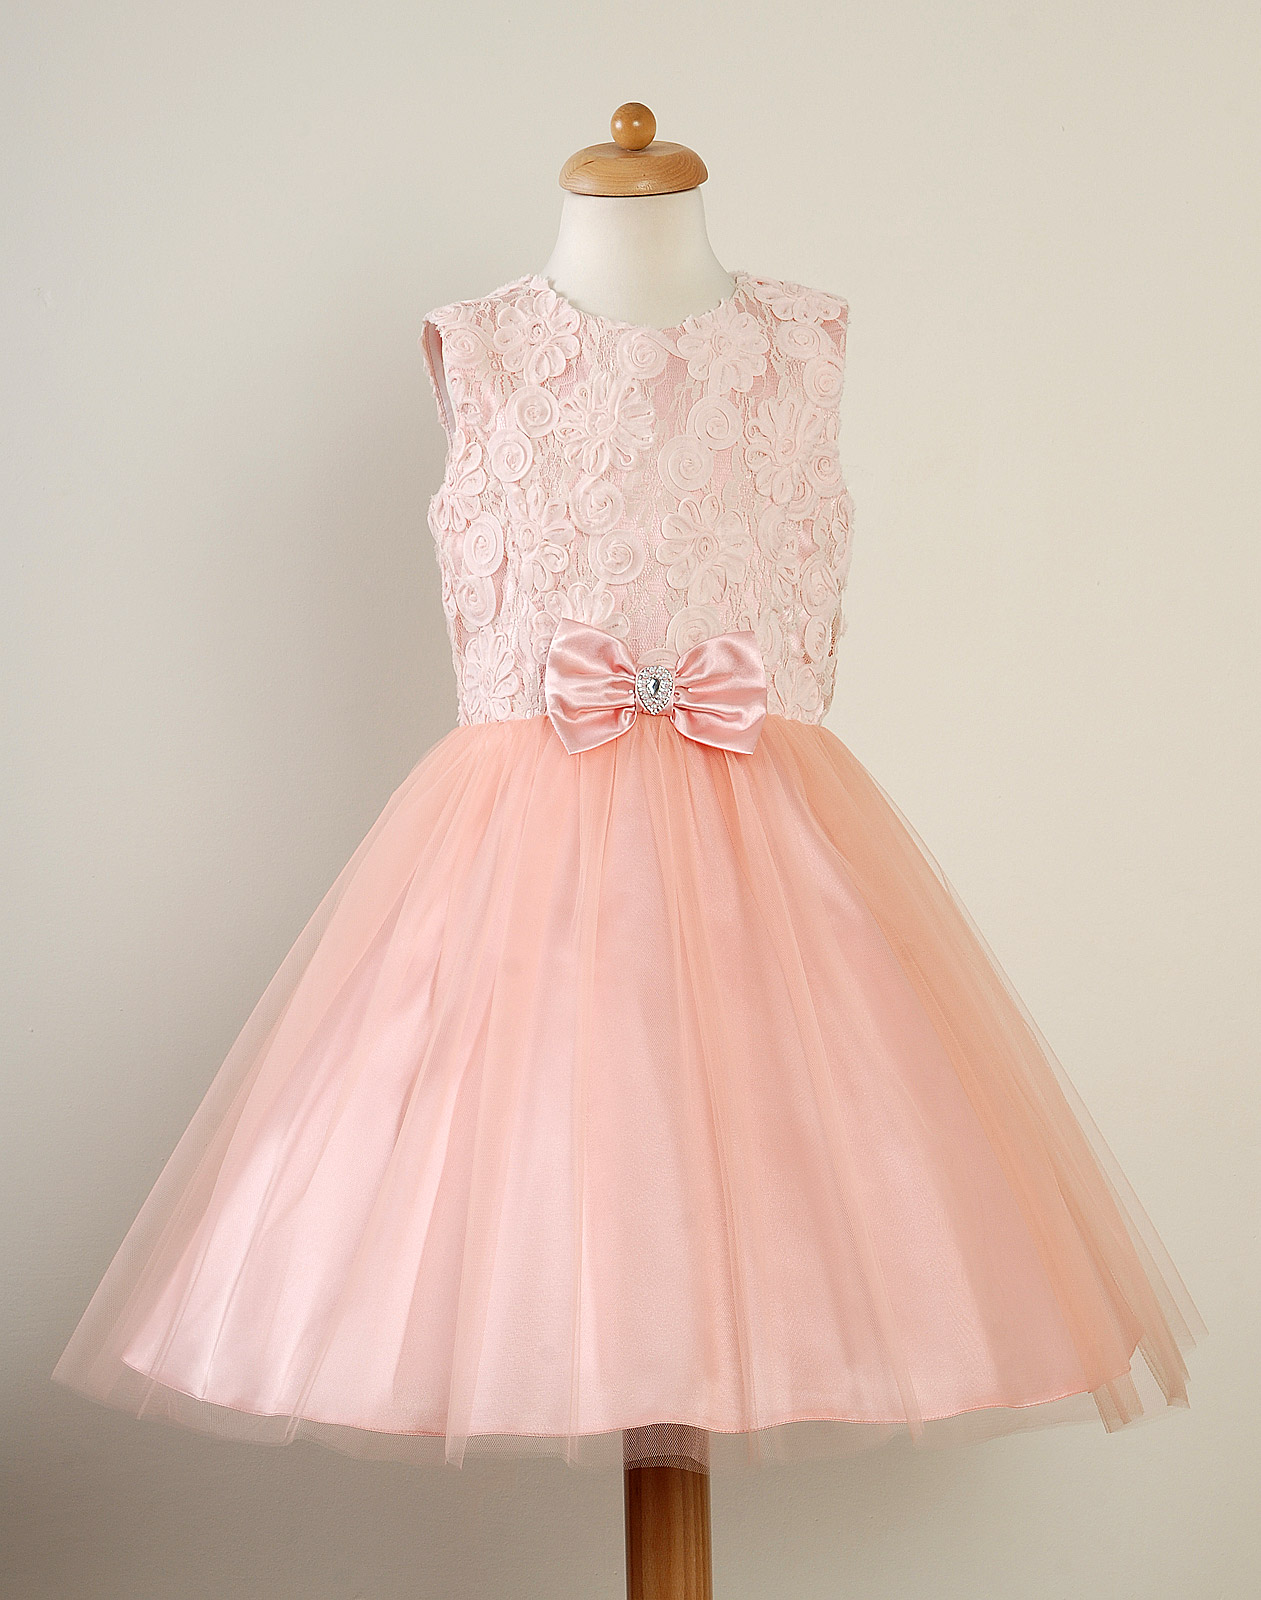 cf1cdb73ab Sukienka dla dziewczynki na wesele.   environment cache images 300 300 productGfx 66616323470ef04f5ad6578ee37277c2.jpg  ...